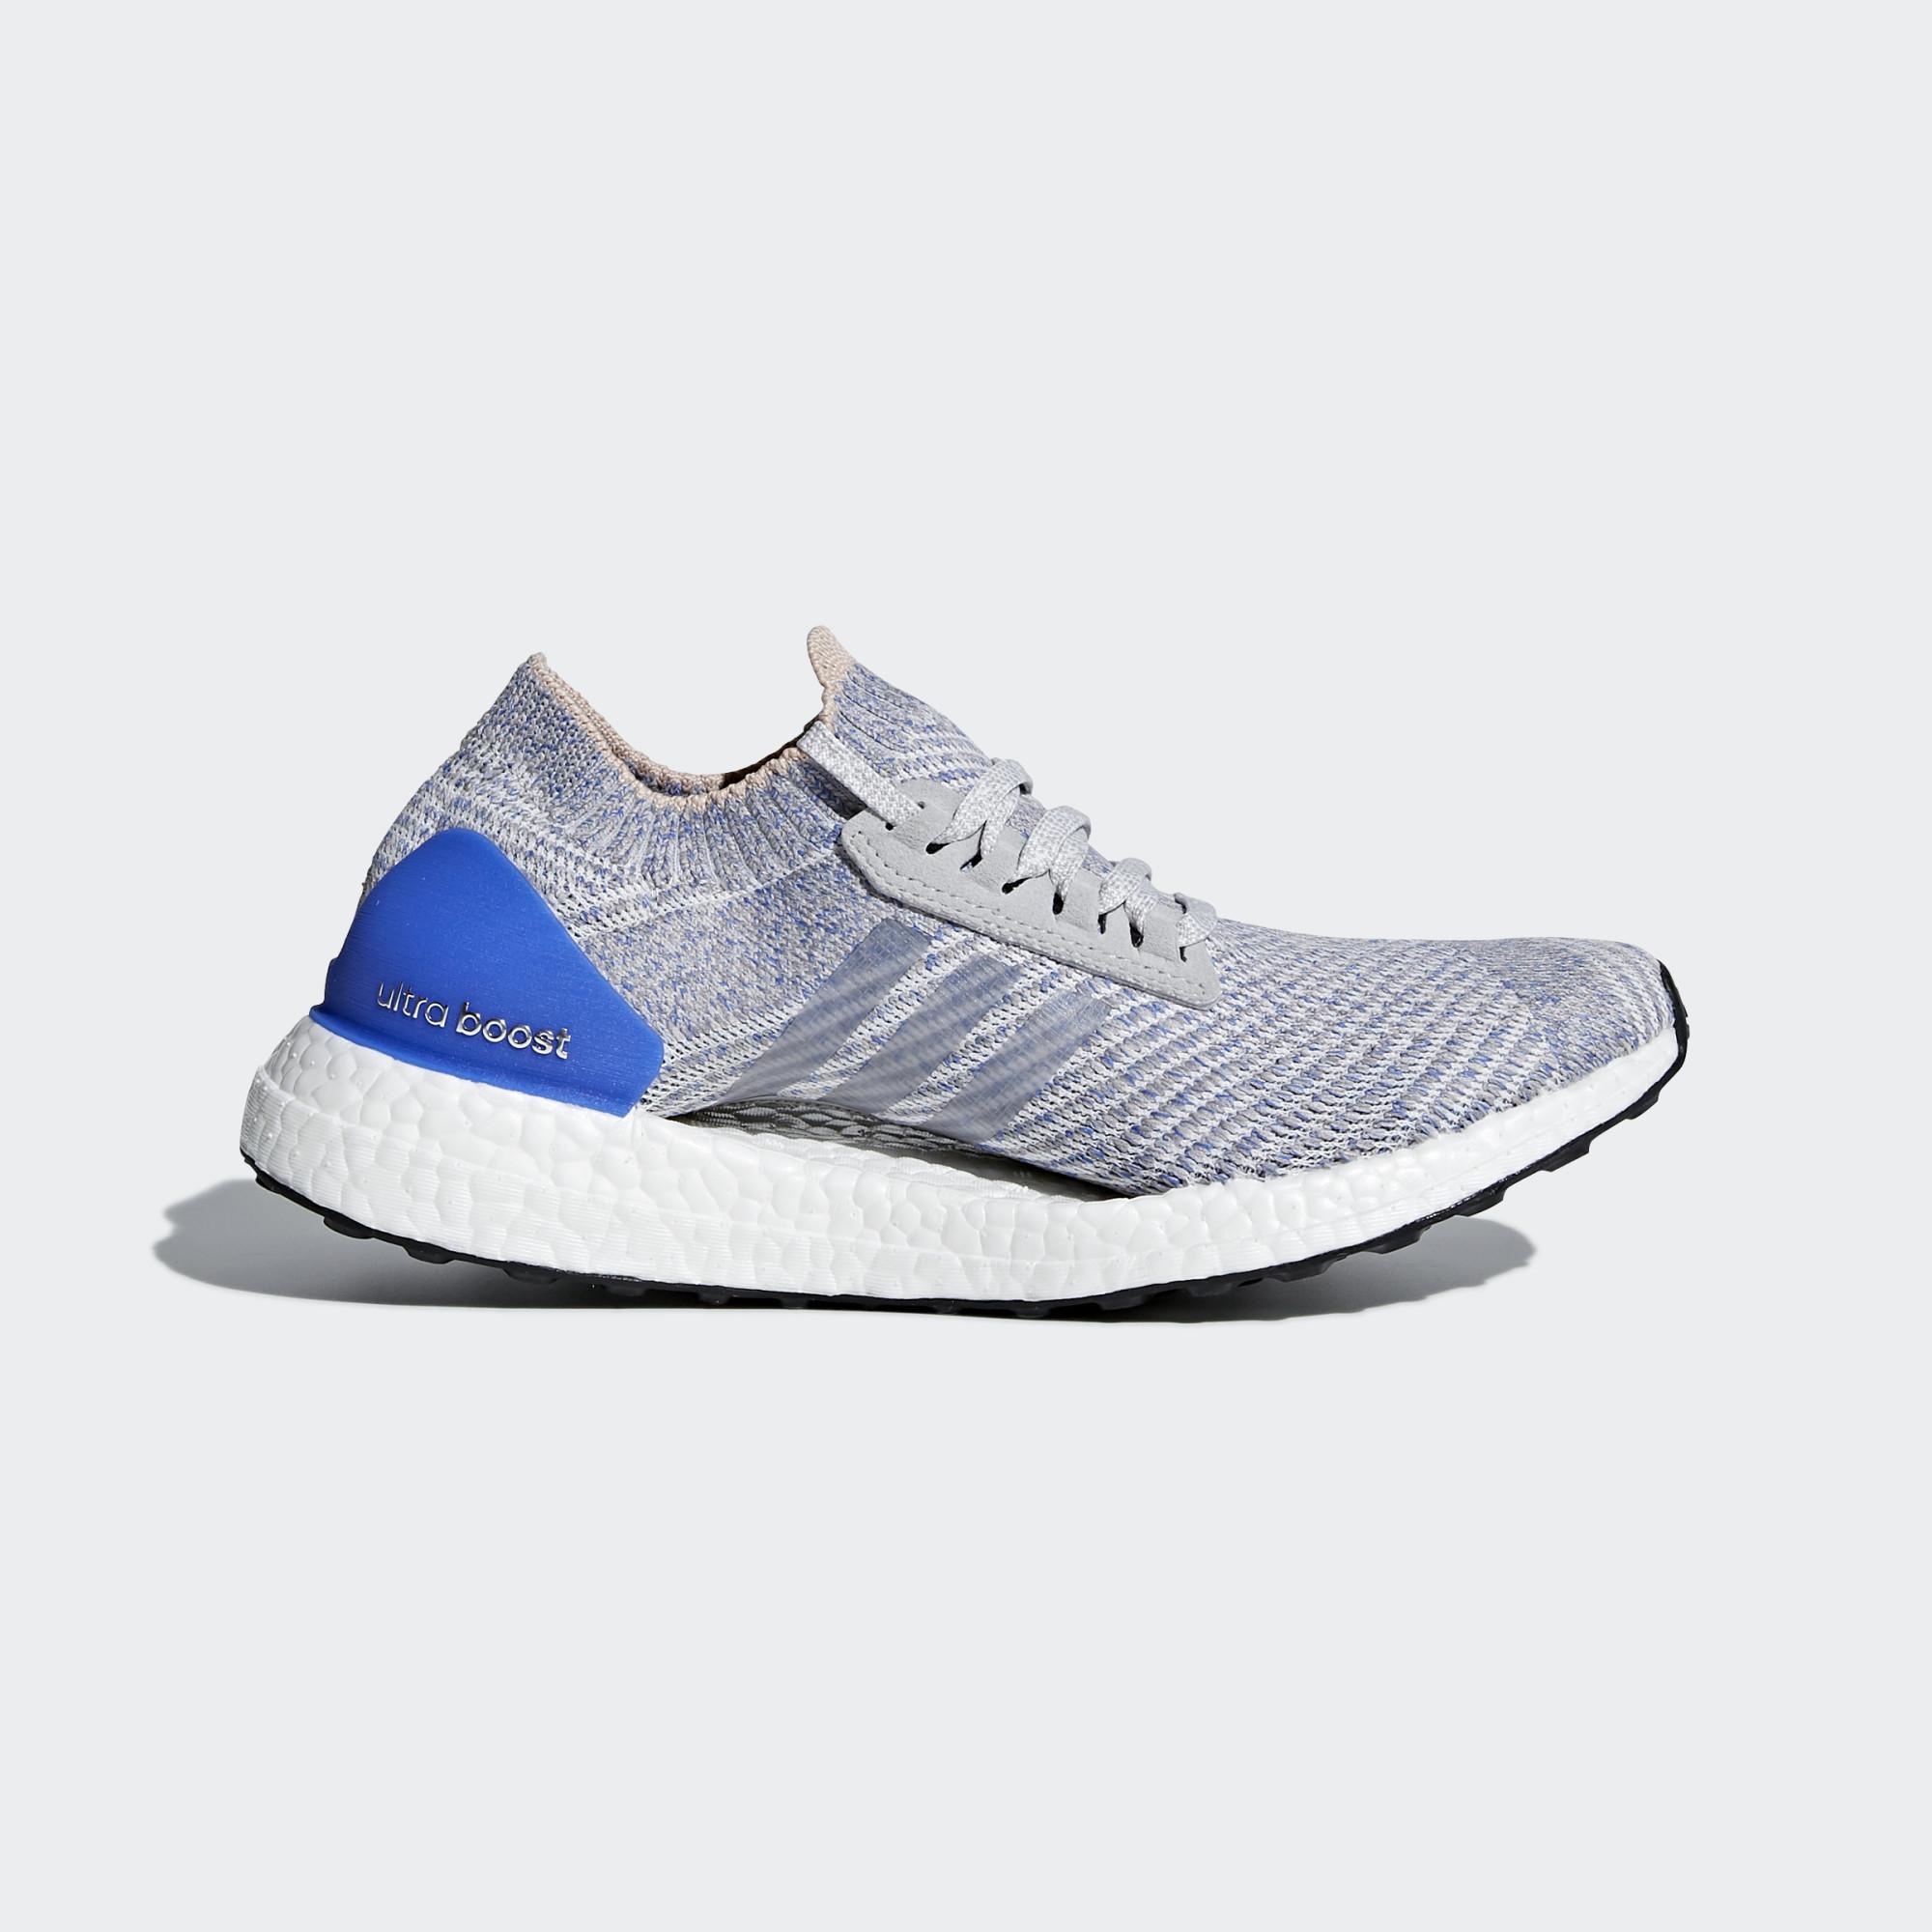 Adidas Ultraboost X